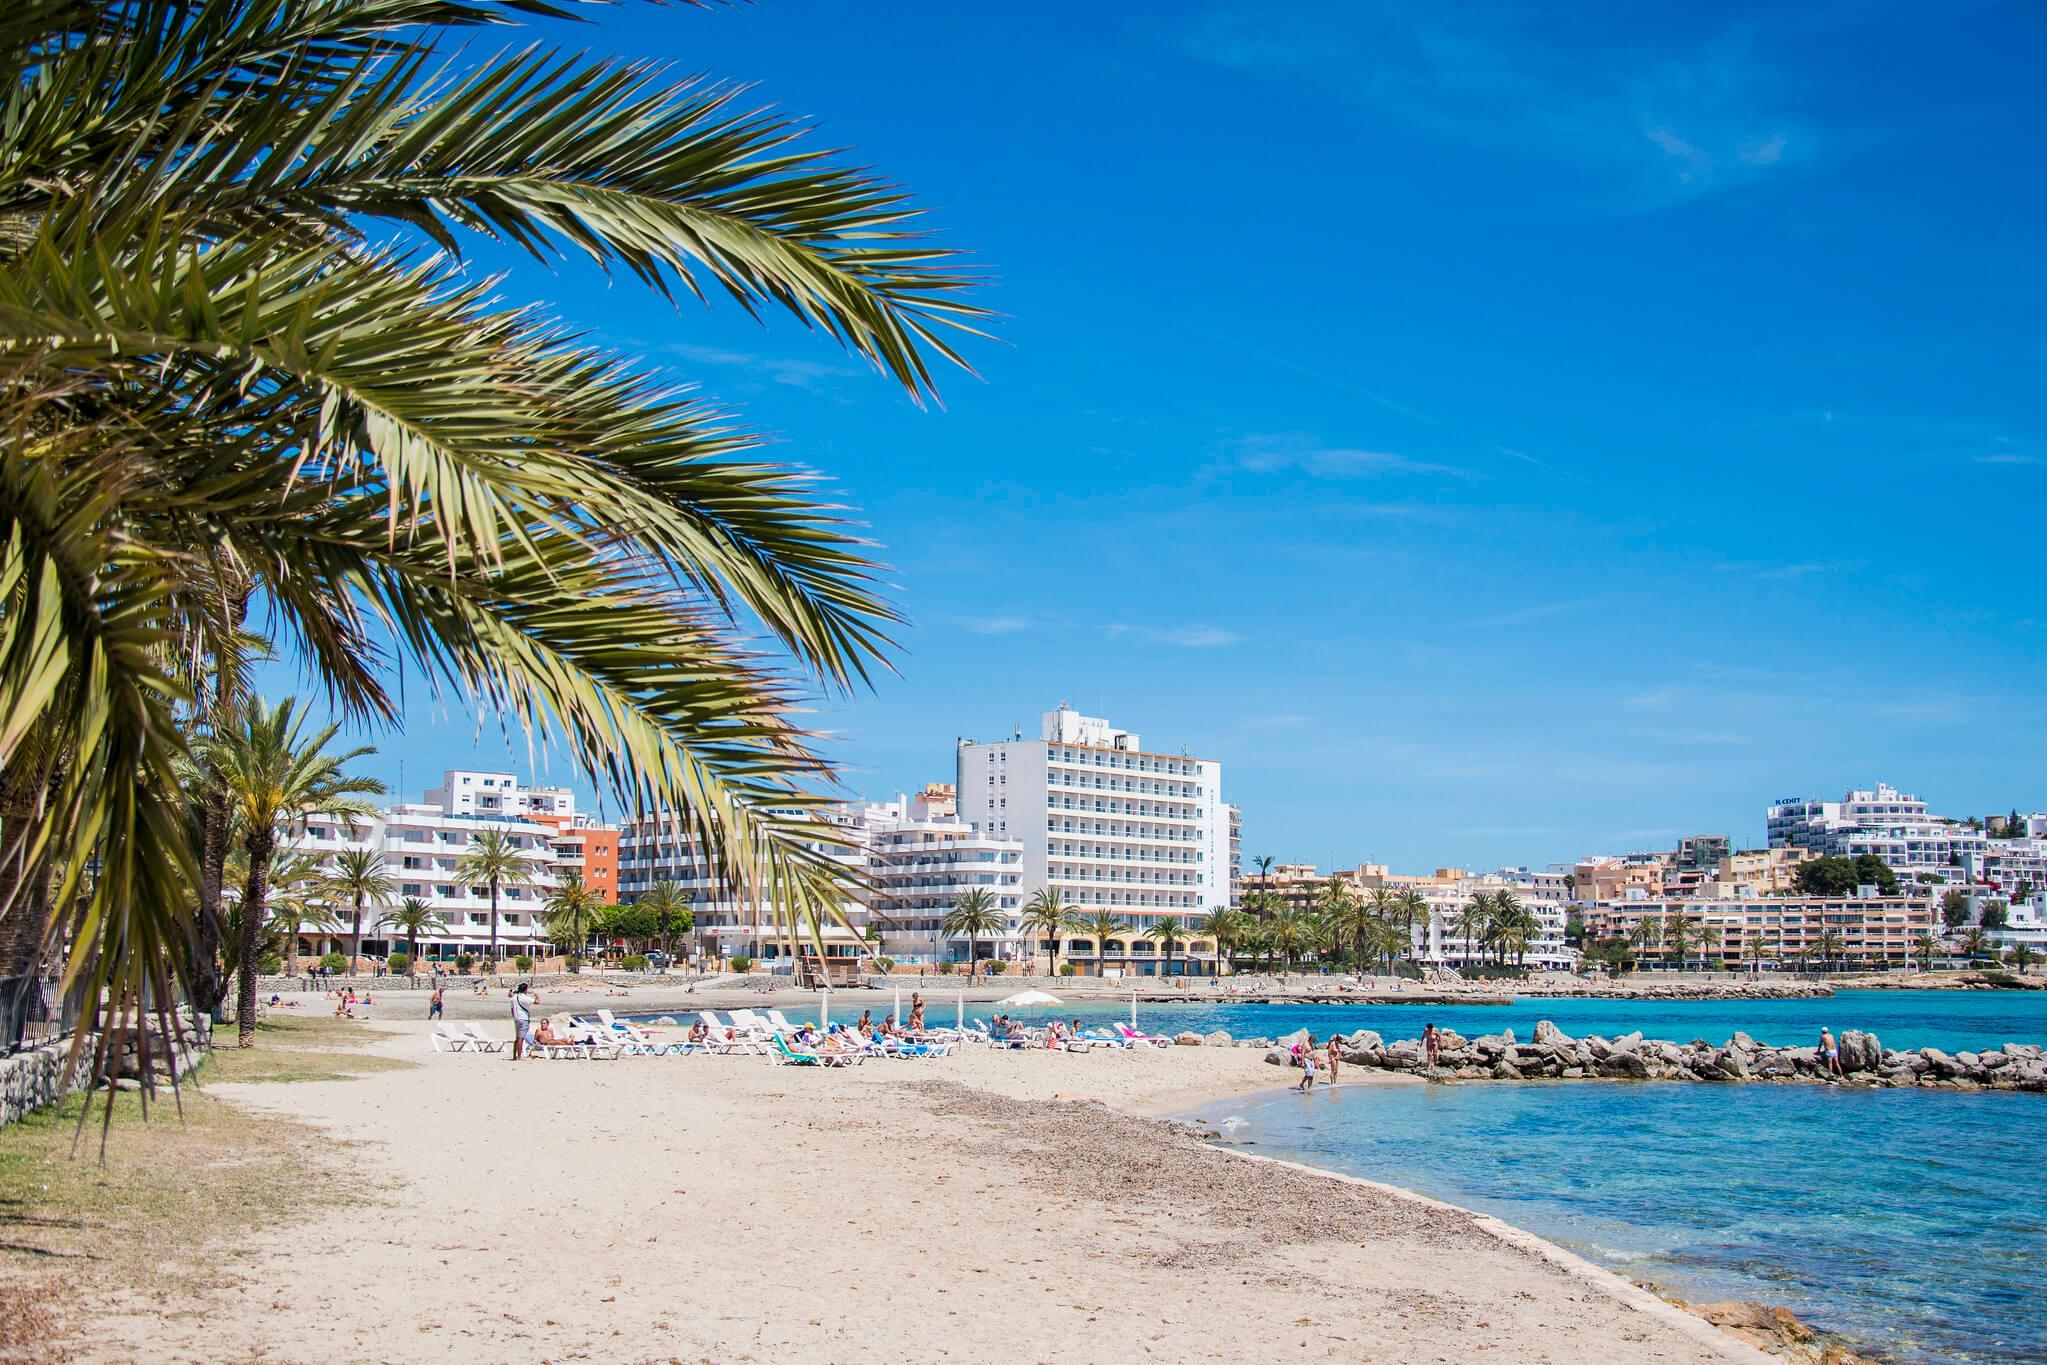 https://www.white-ibiza.com/wp-content/uploads/2020/03/ibiza-beaches-figueretas-04.jpg